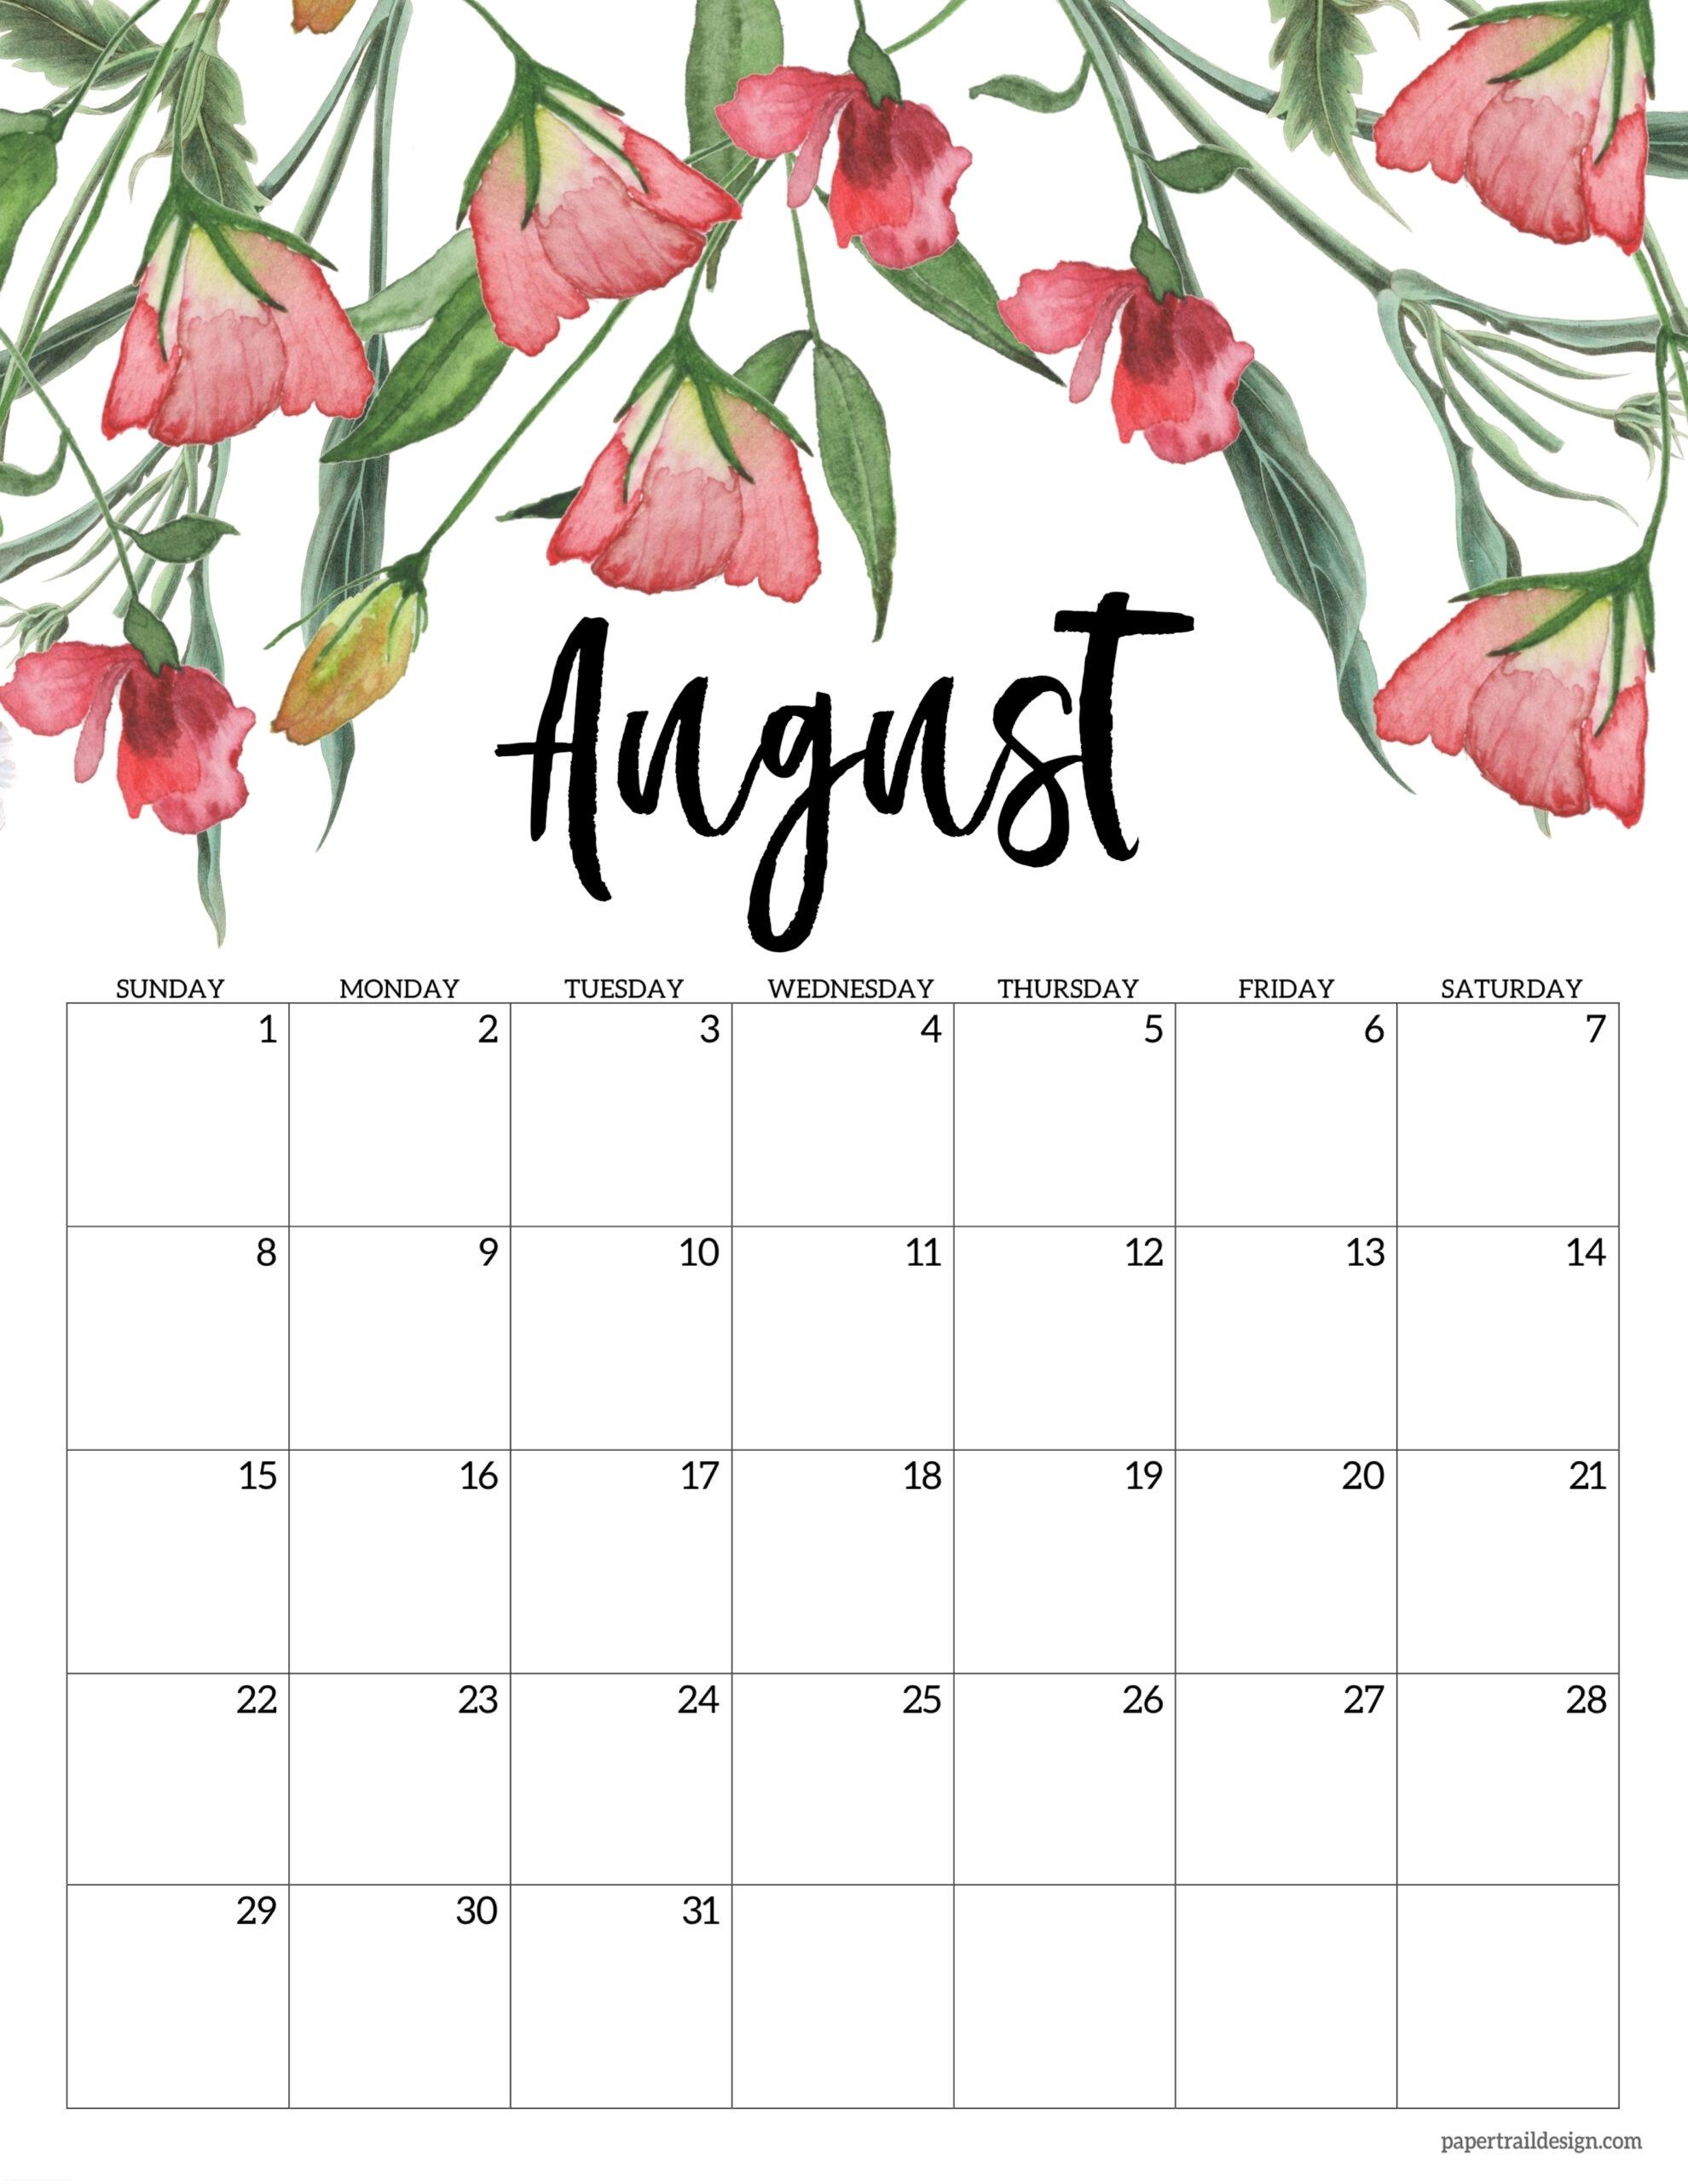 Free Printable 2021 Floral Calendar | Paper Trail Design August 2021 Calendar Print